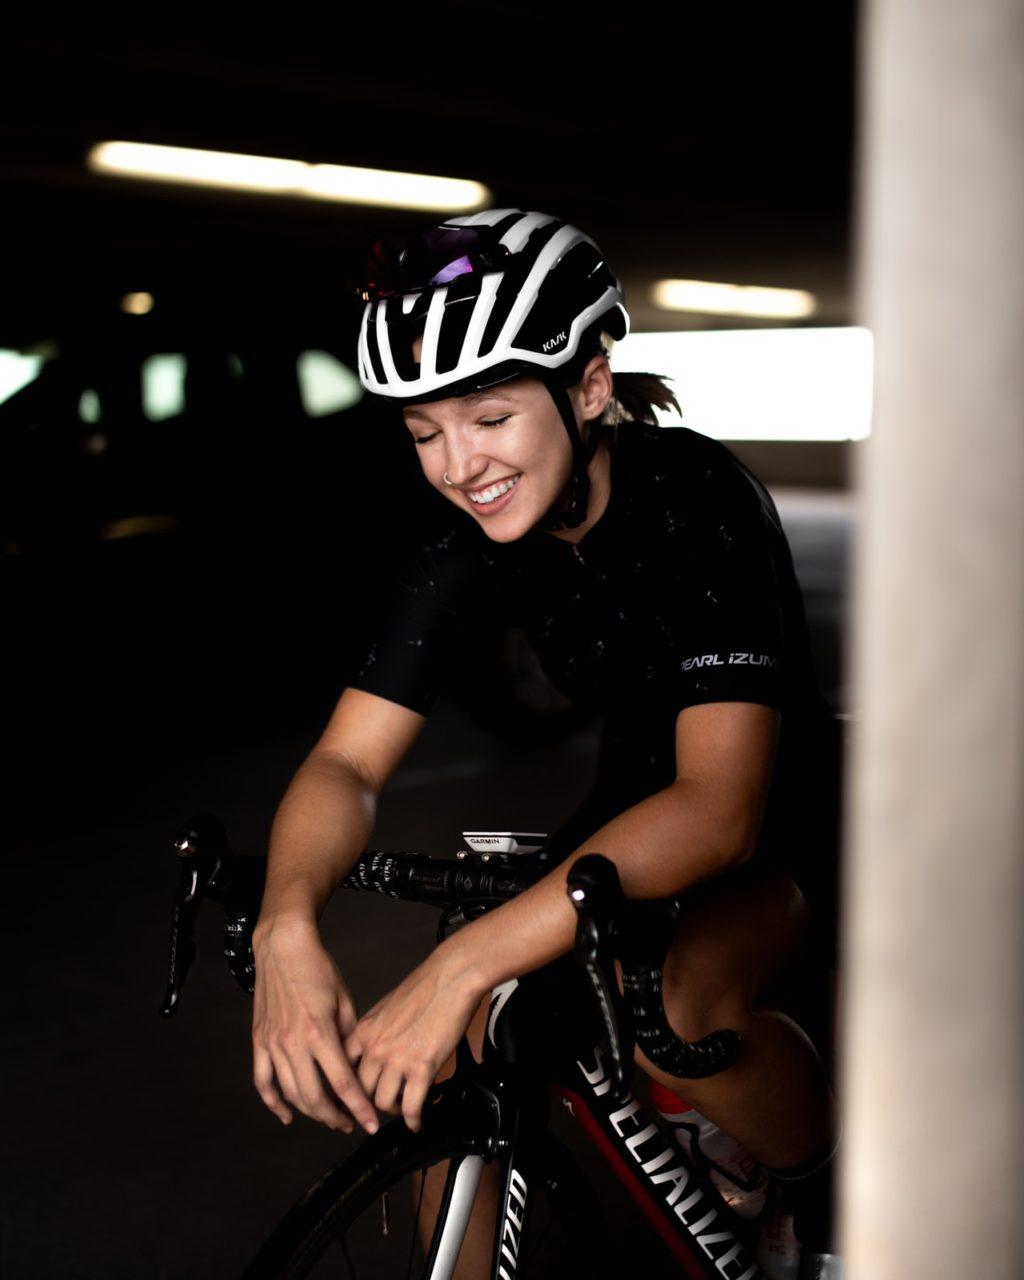 photo of woman riding bike